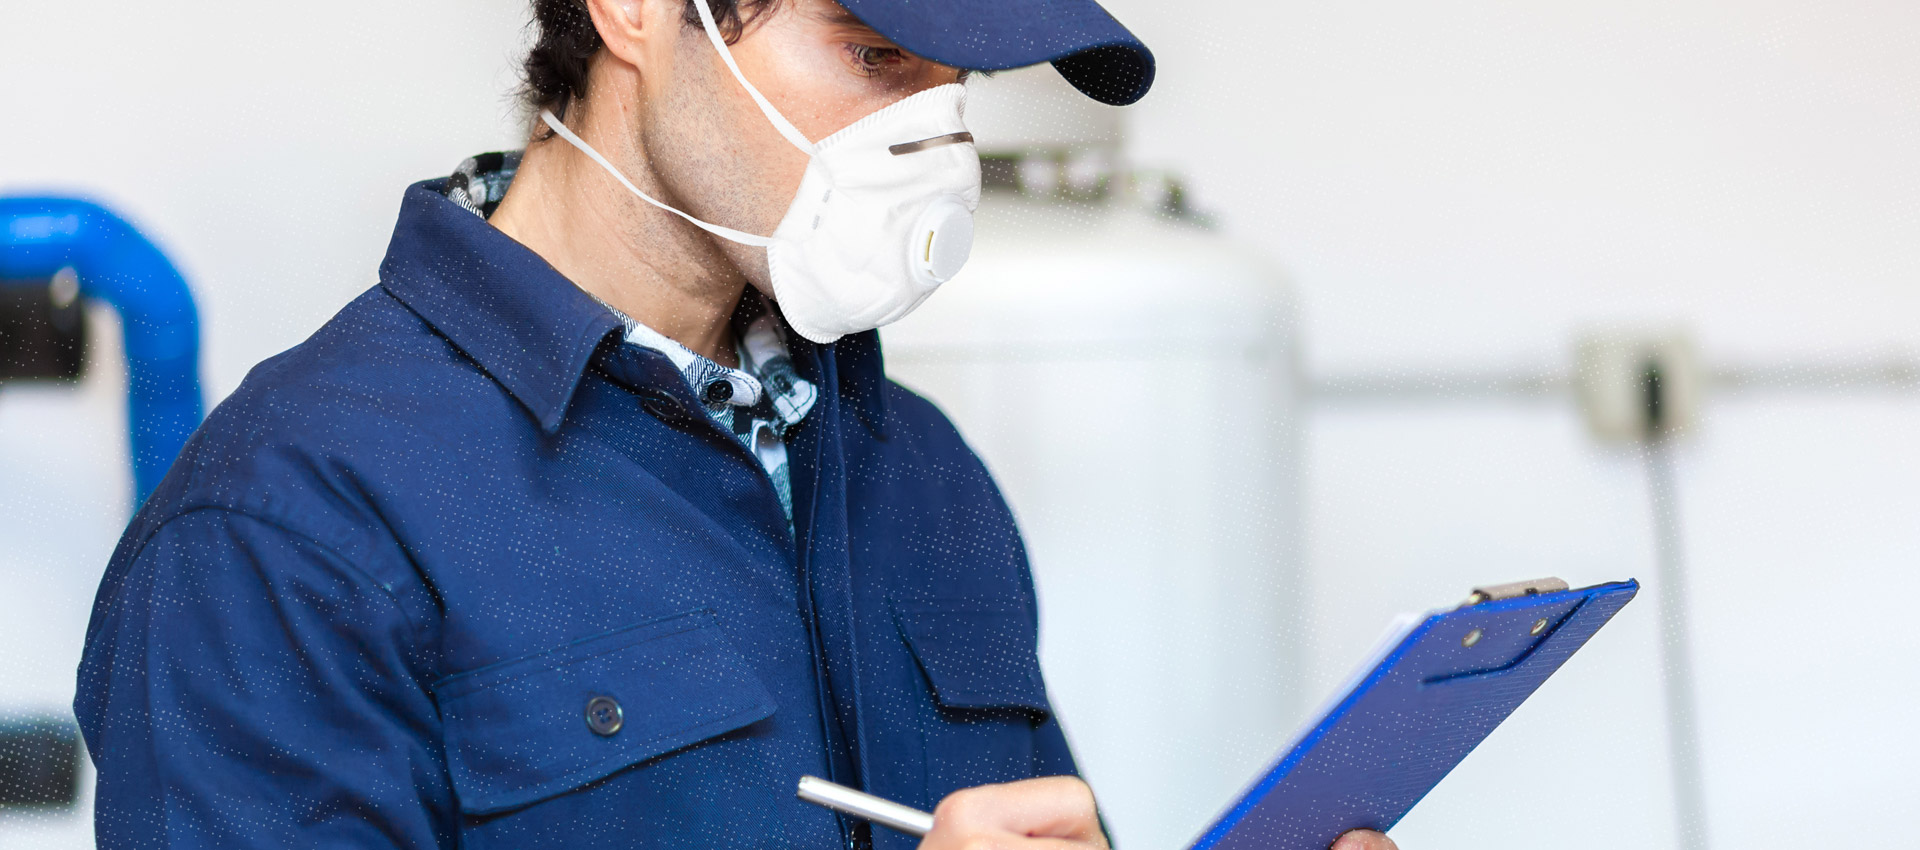 Swift Brothers - Technician N95 Mask